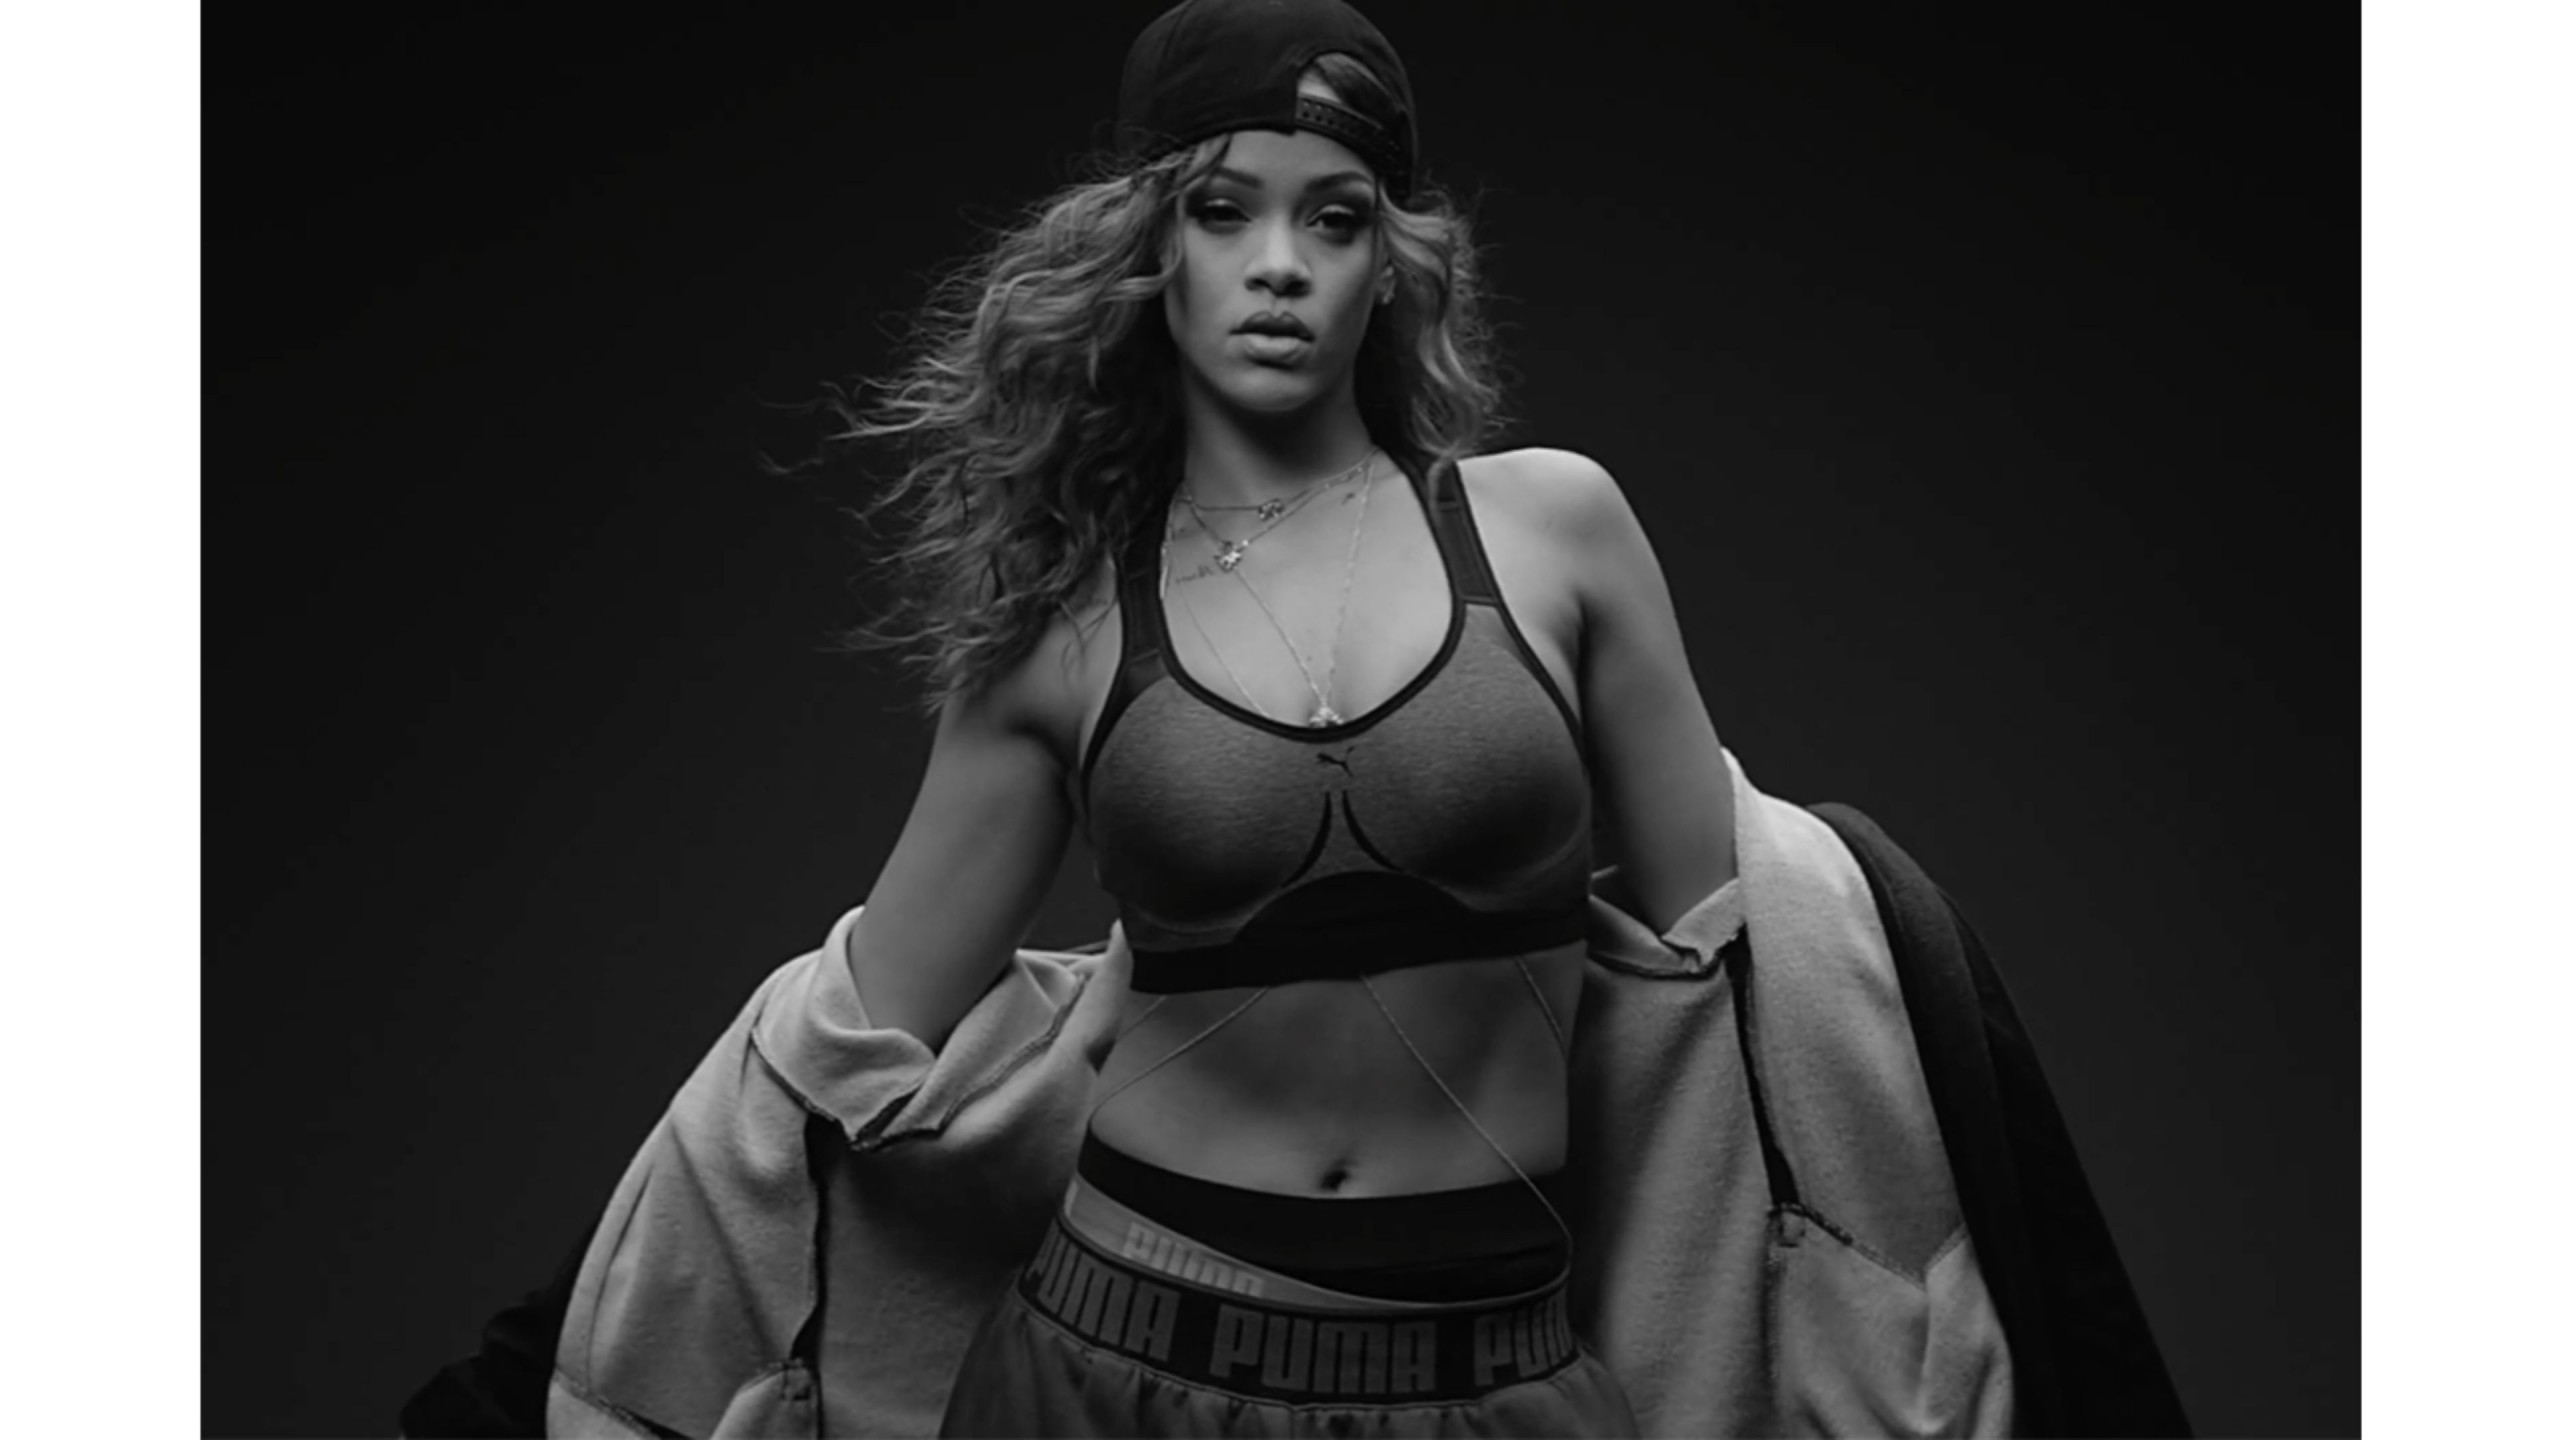 Cool 4K Rihanna Wallpaper | Free 4K Wallpaper